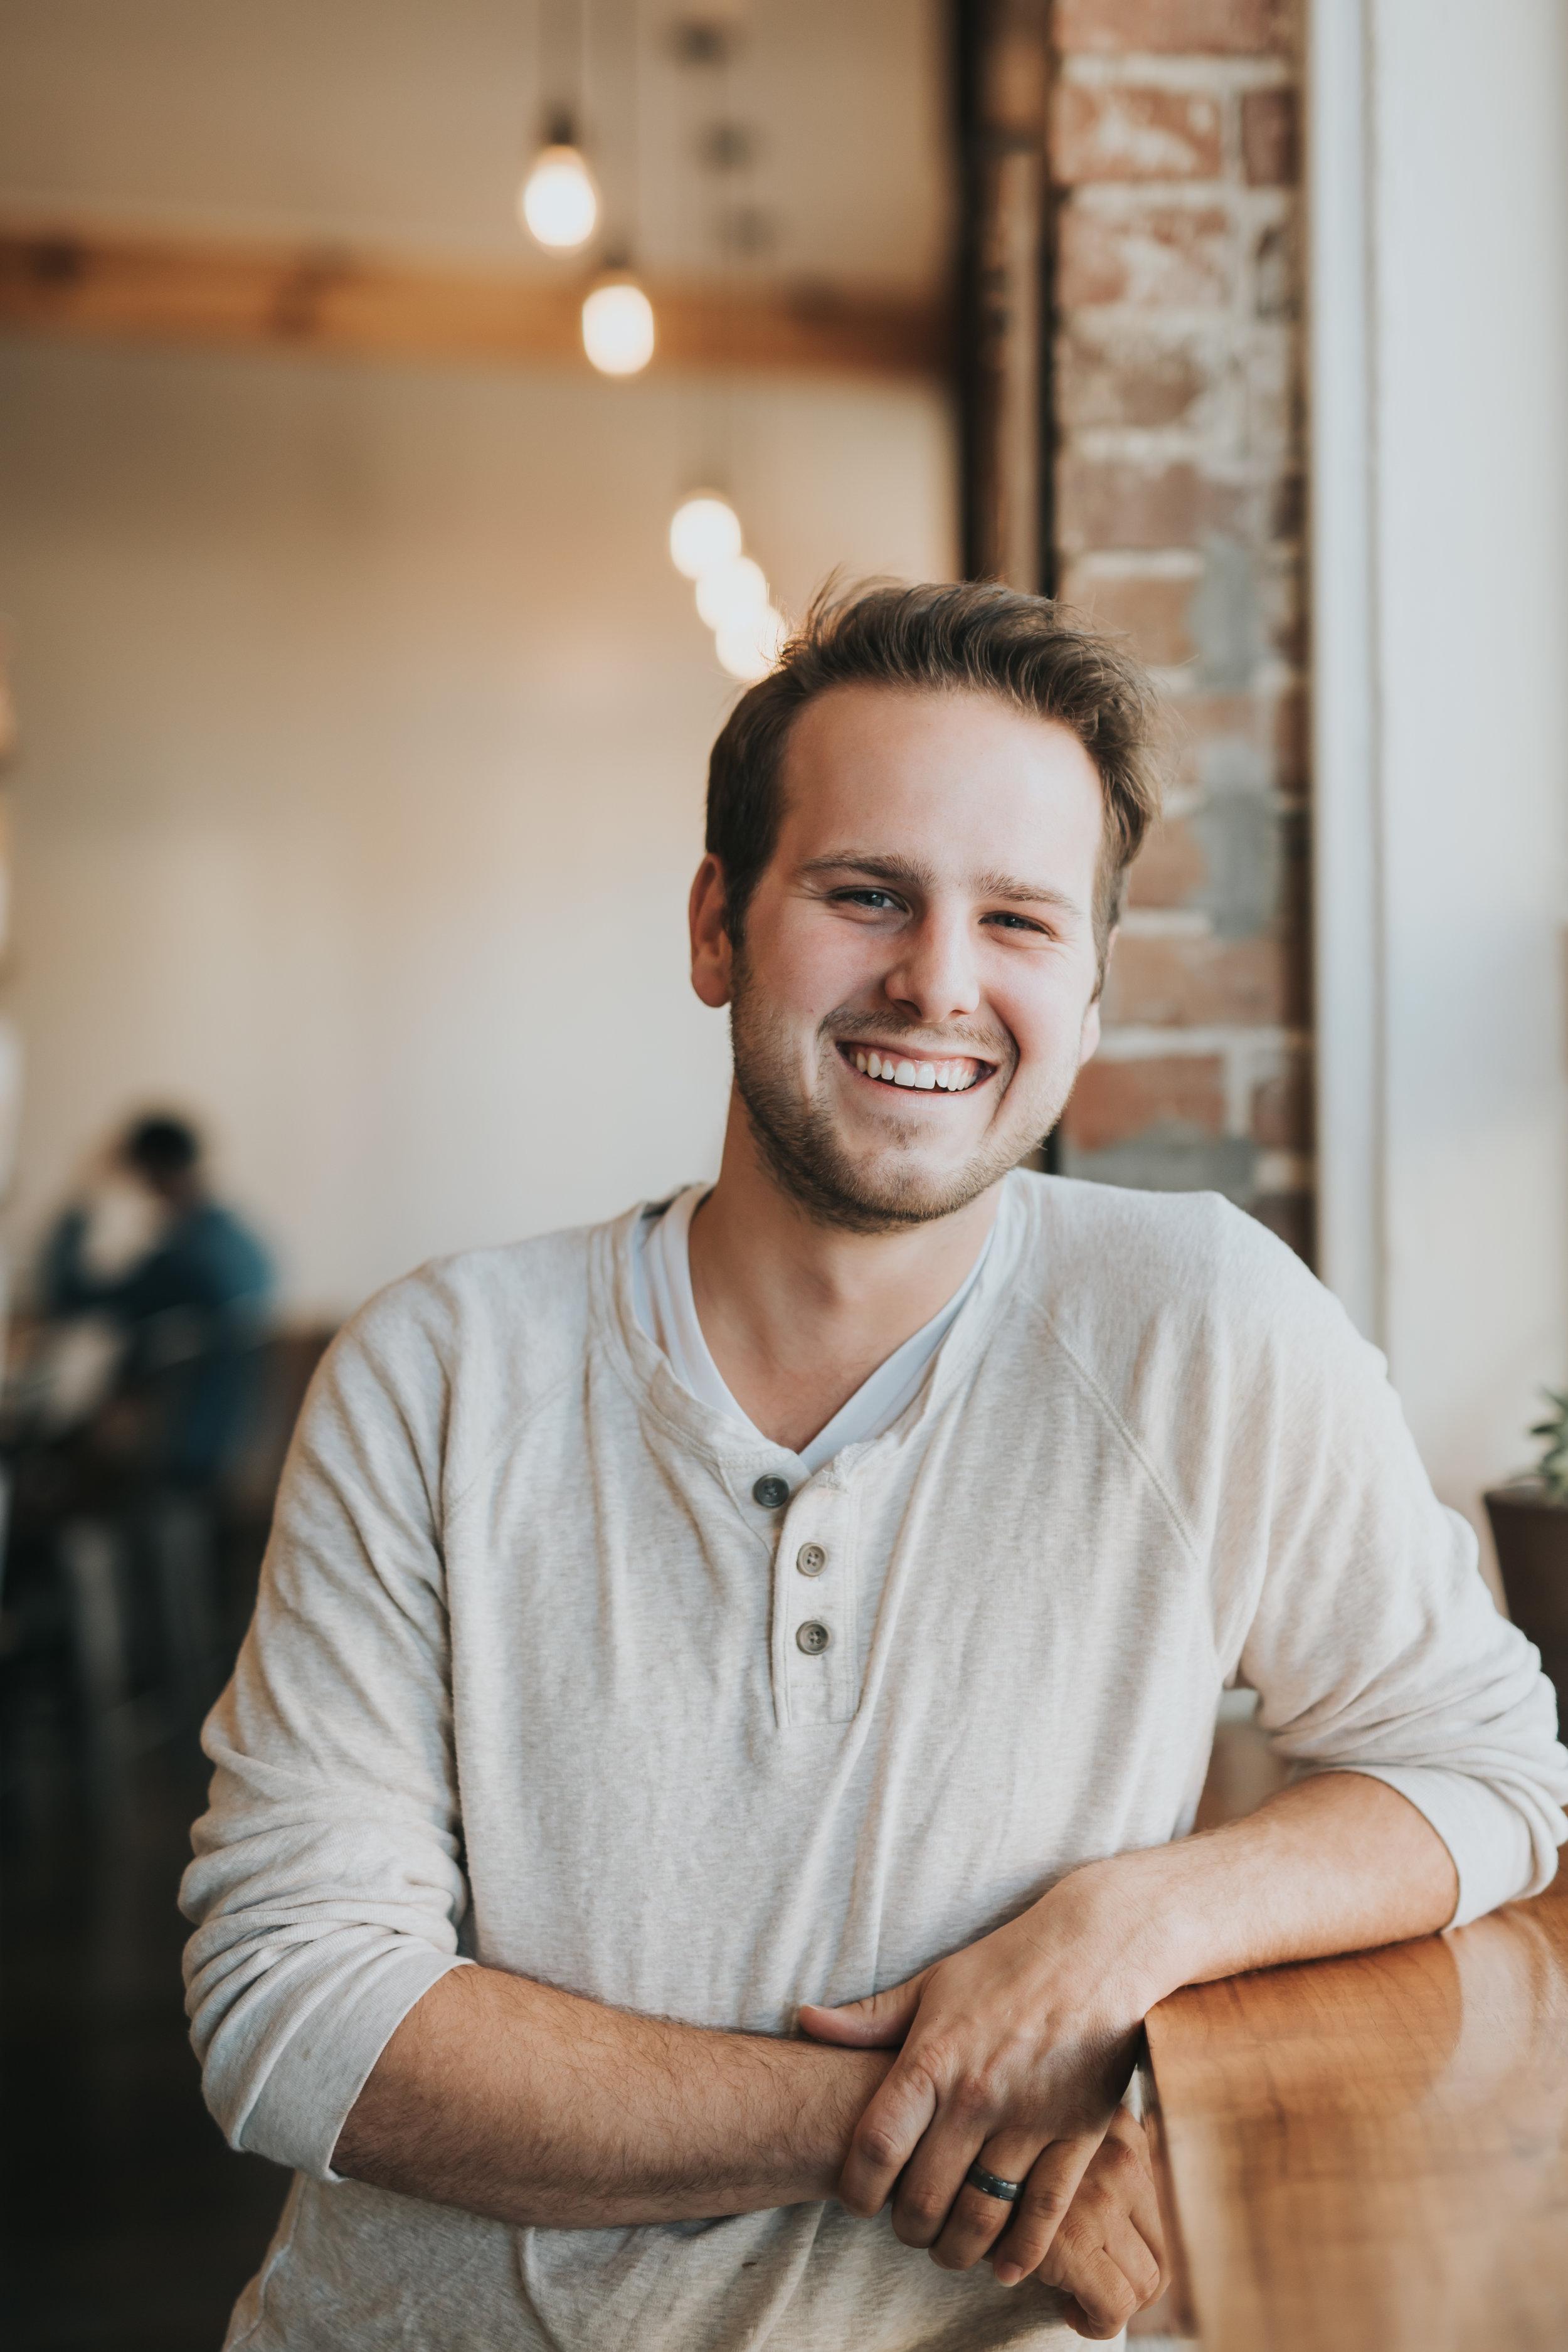 Kyle merle Mckean - Photographer, Videographer, Shot Caller